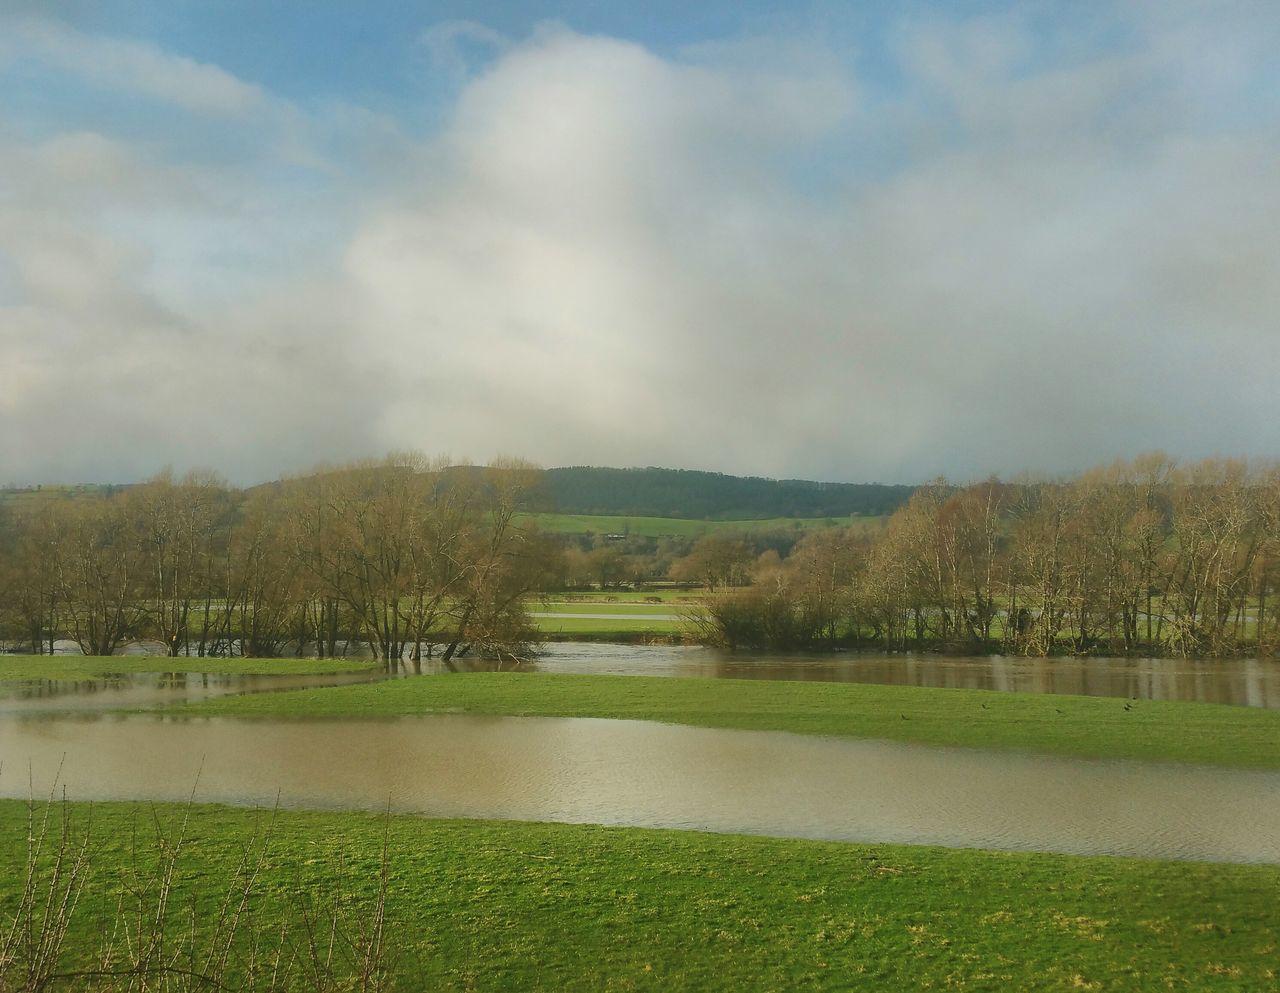 Our Valley looked more like a lake recently. .. Flood Flooding Hafren Severn River Wales Powys река Разлив деревья пойма Meadow Fields